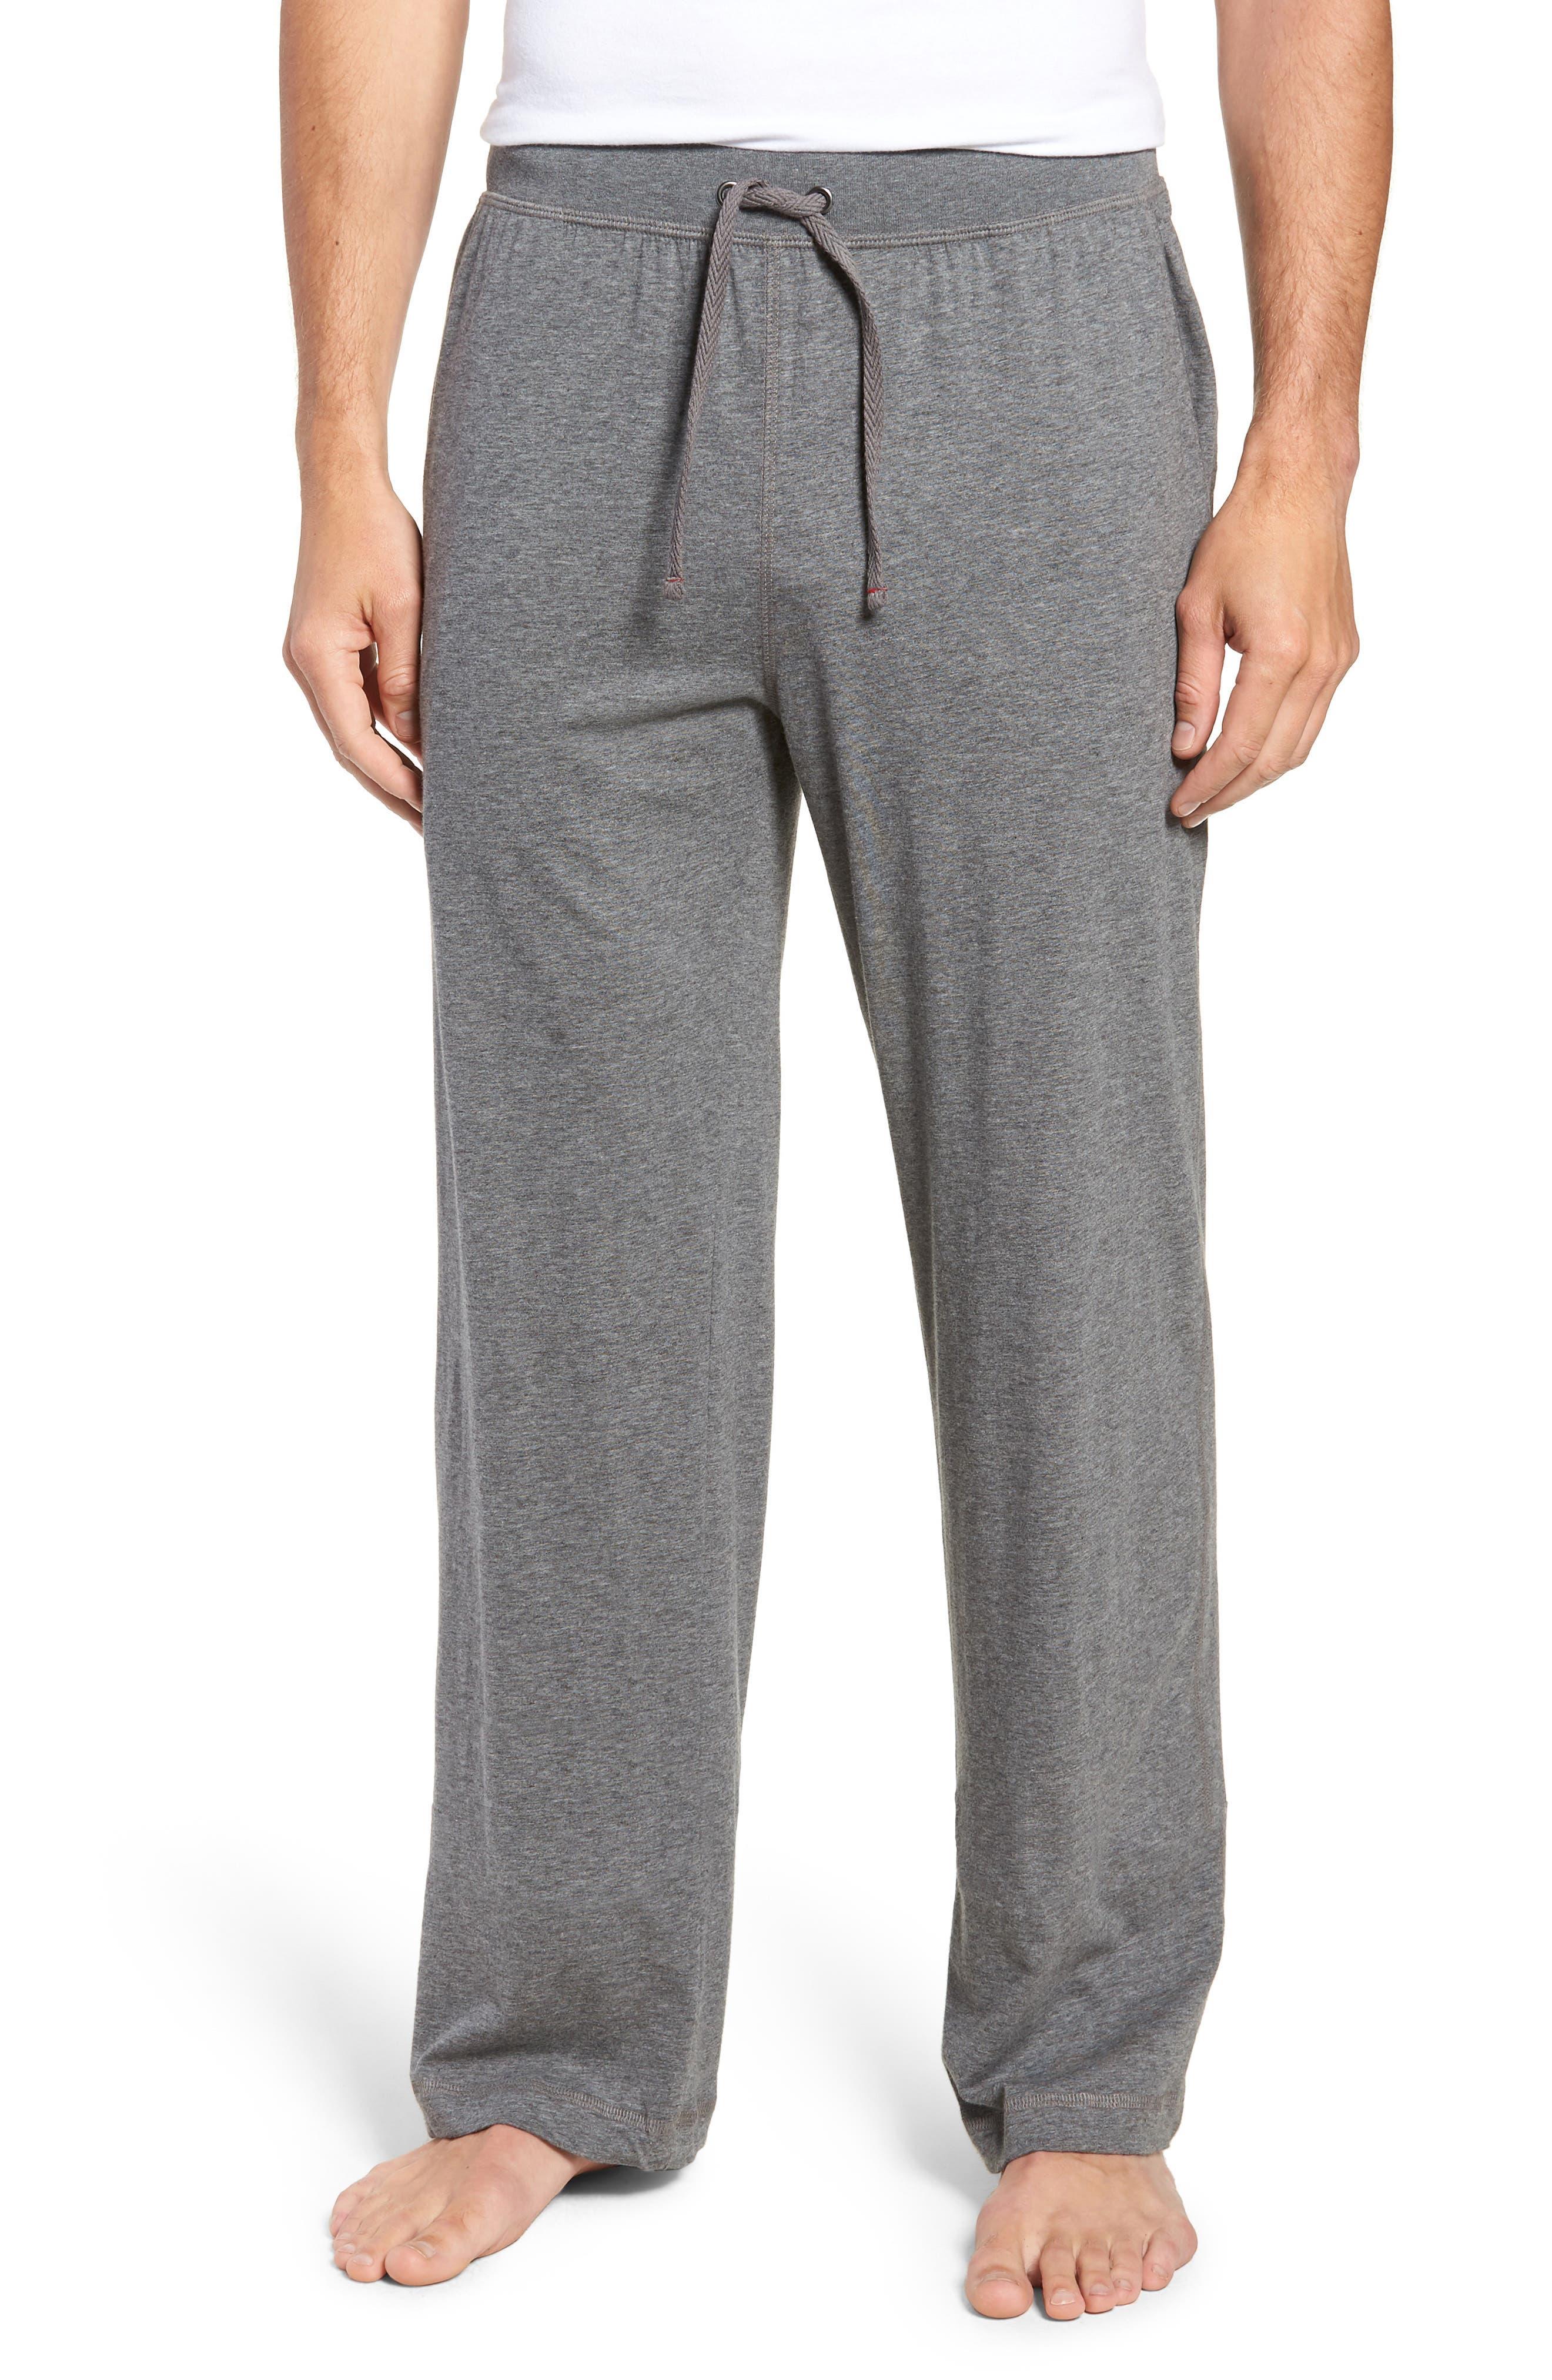 Peruvian Pima Lightweight Cotton Lounge Pants, Main, color, CHARCOAL HEATHER